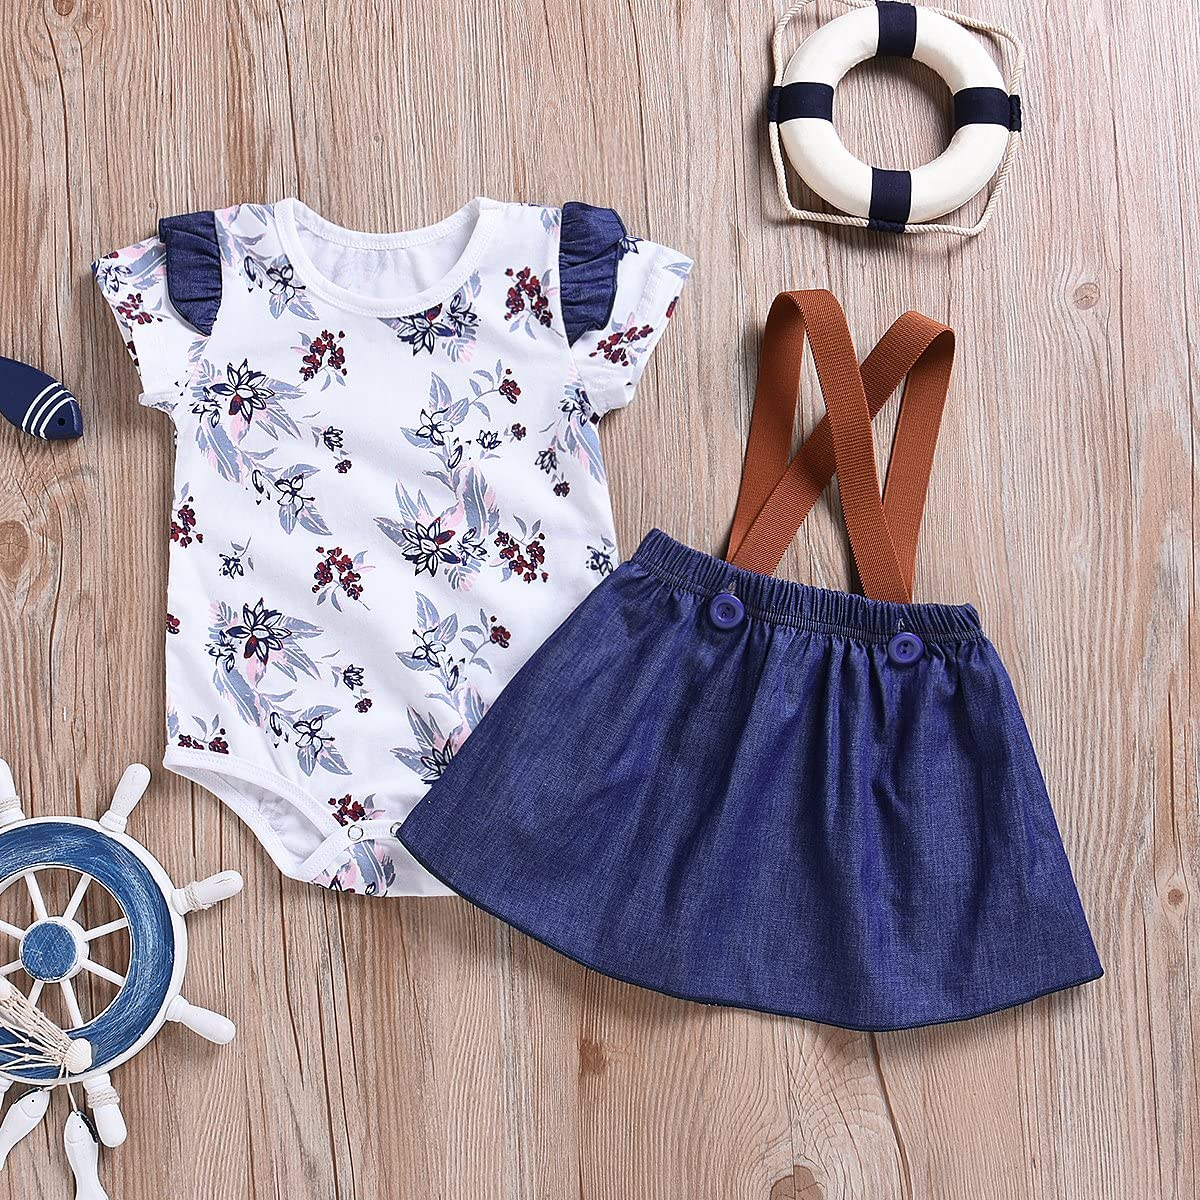 Denim Skirt Outfits Set 2pcs Cute Toddler Baby Girls Princess Floral Print Suspenders Ruffled Romper Tops